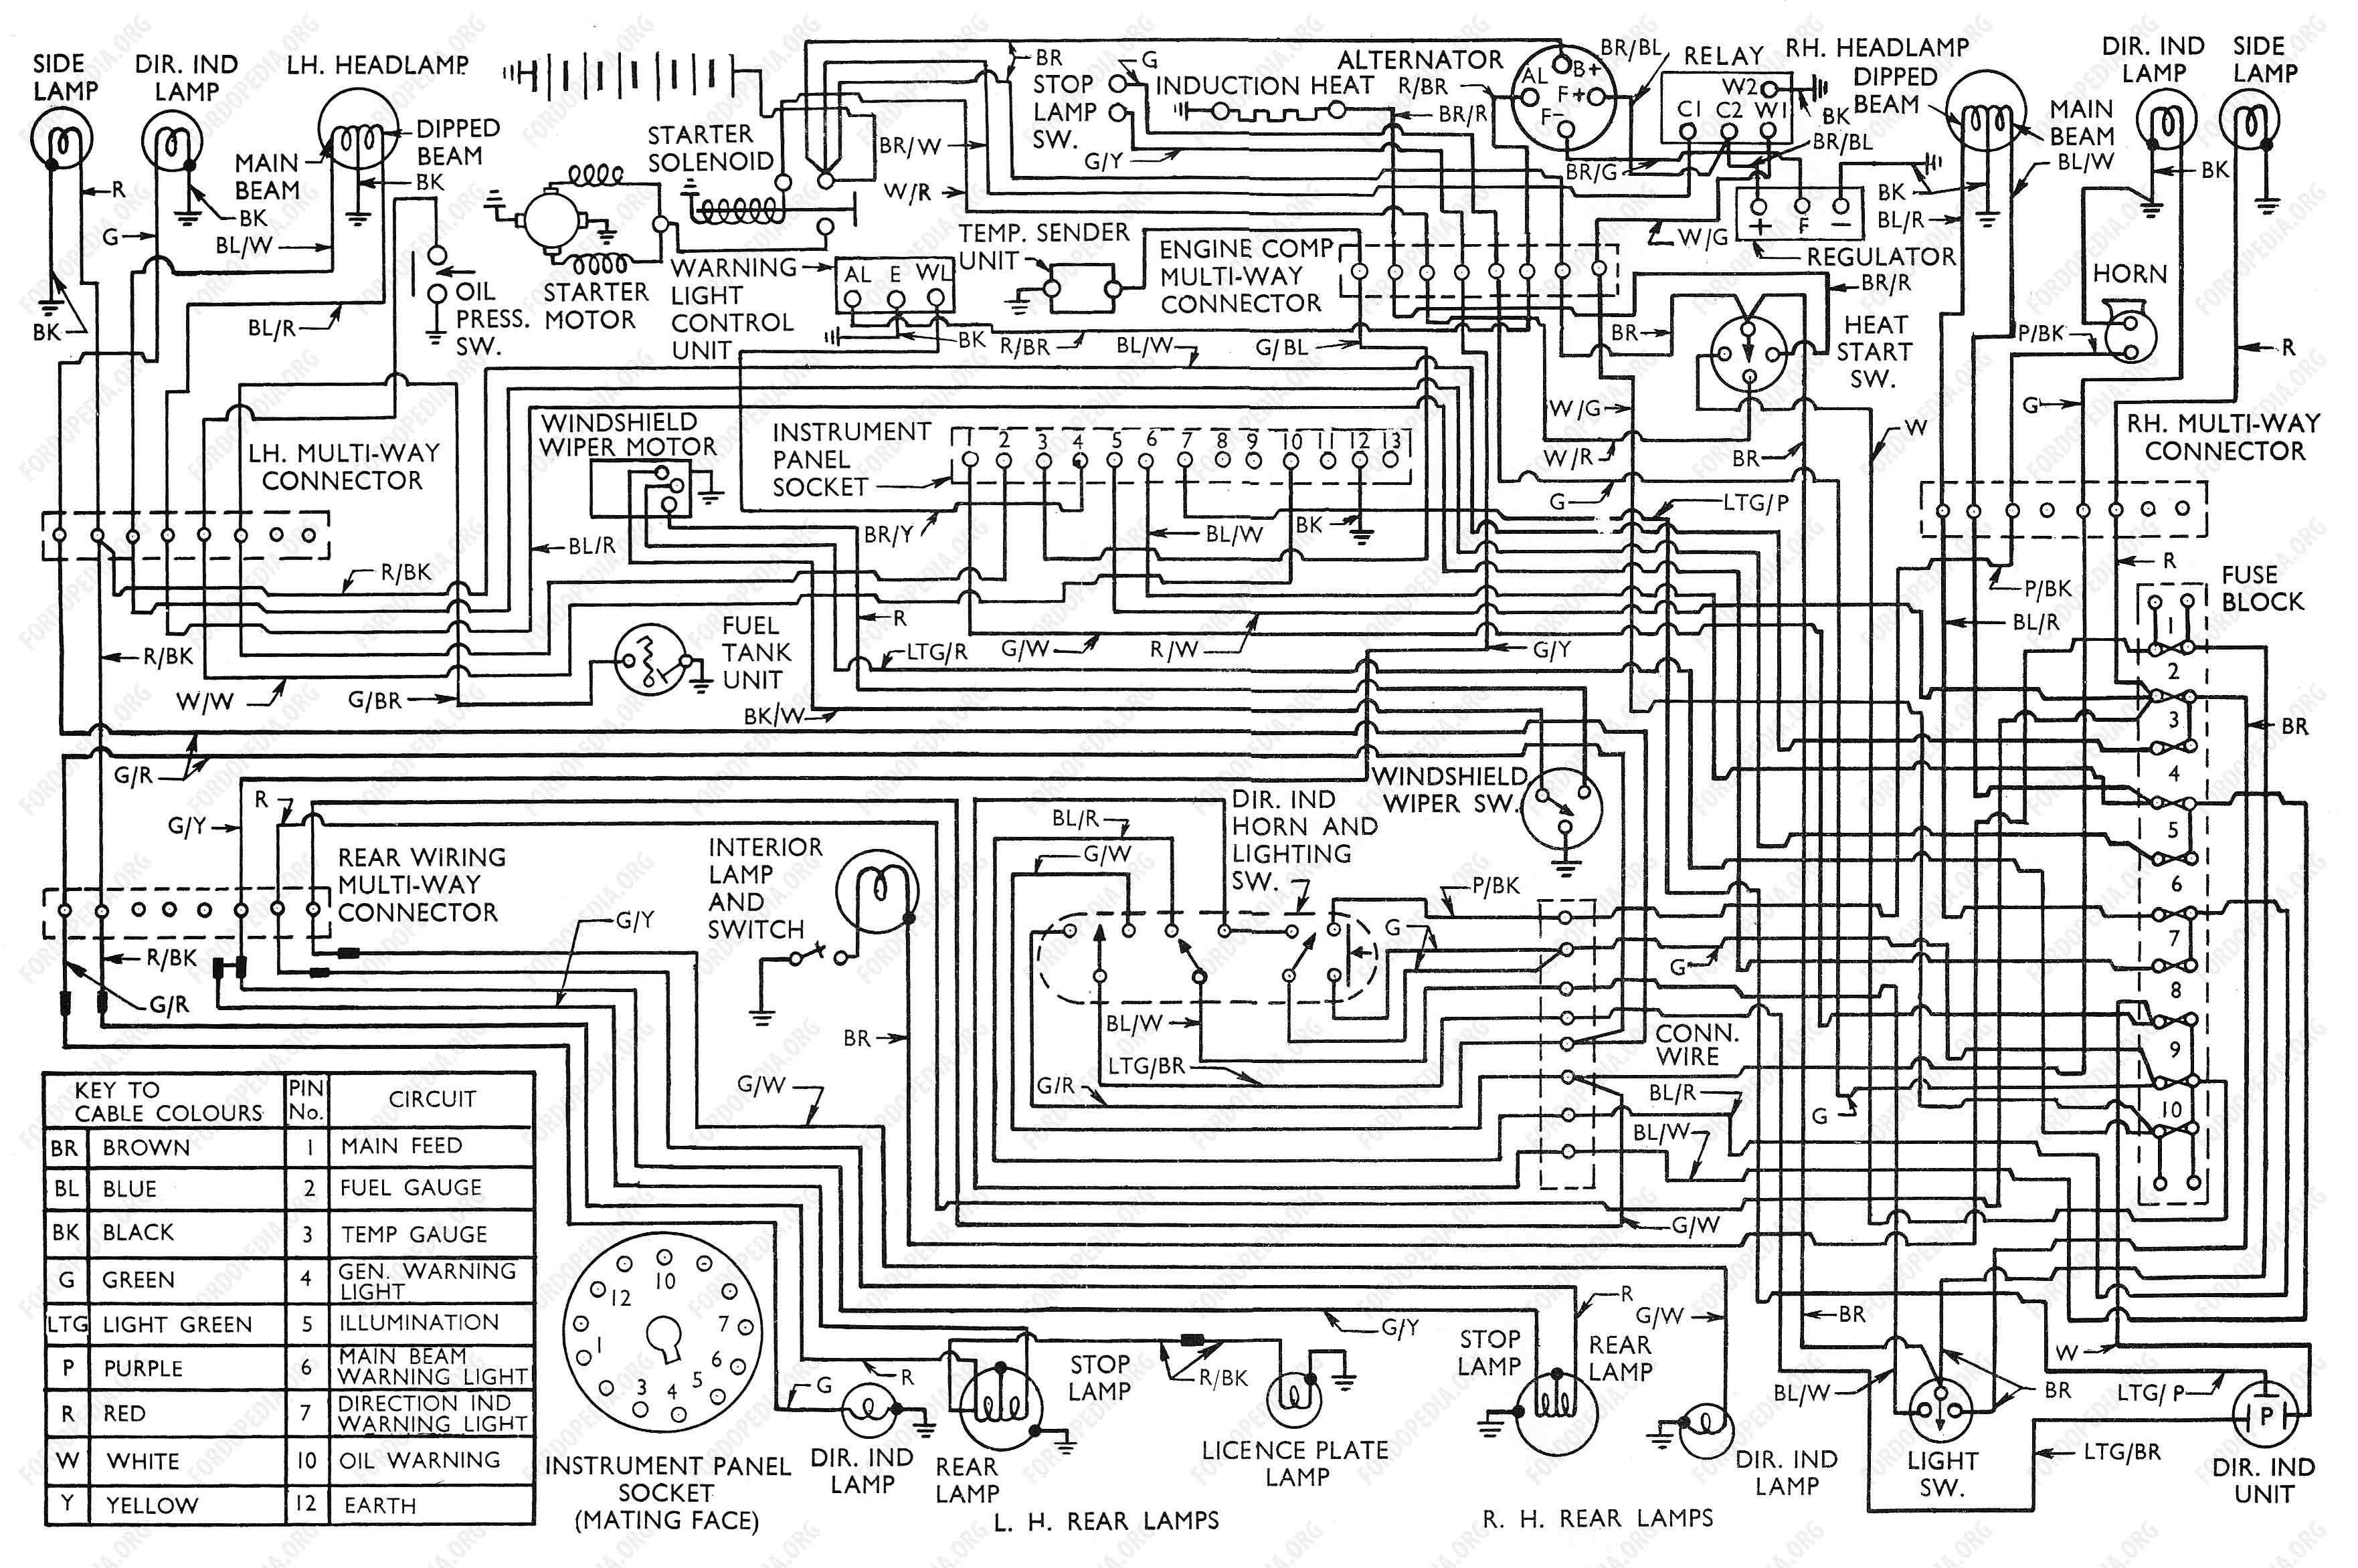 medium resolution of ford van diagram wiring diagram loadford transit diagram wiring diagram used ford van parts diagram ford